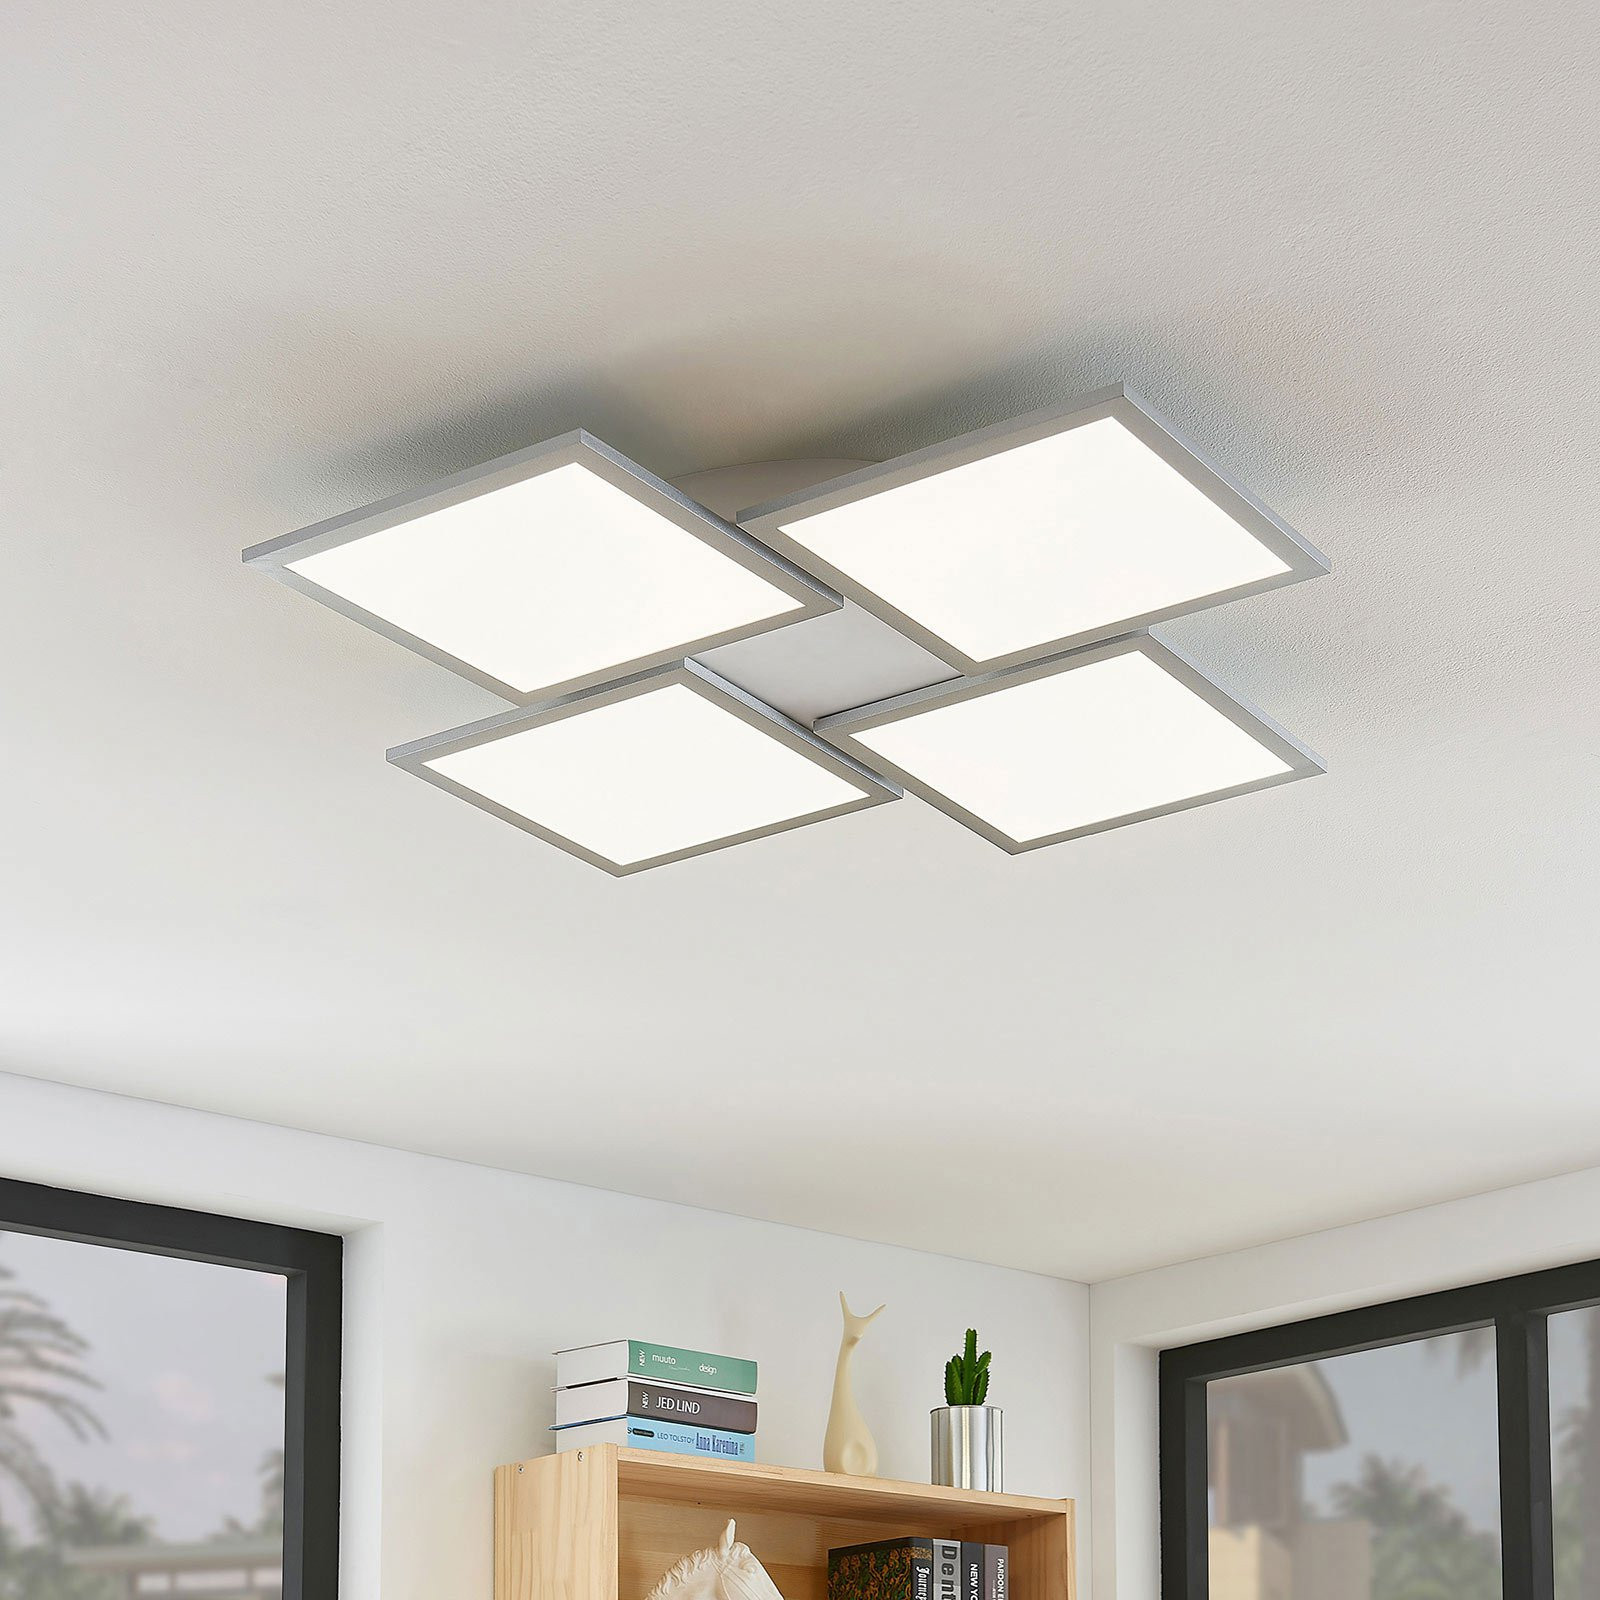 LED-taklampe Ilira, dimbar, CCT, 4 lyskilder